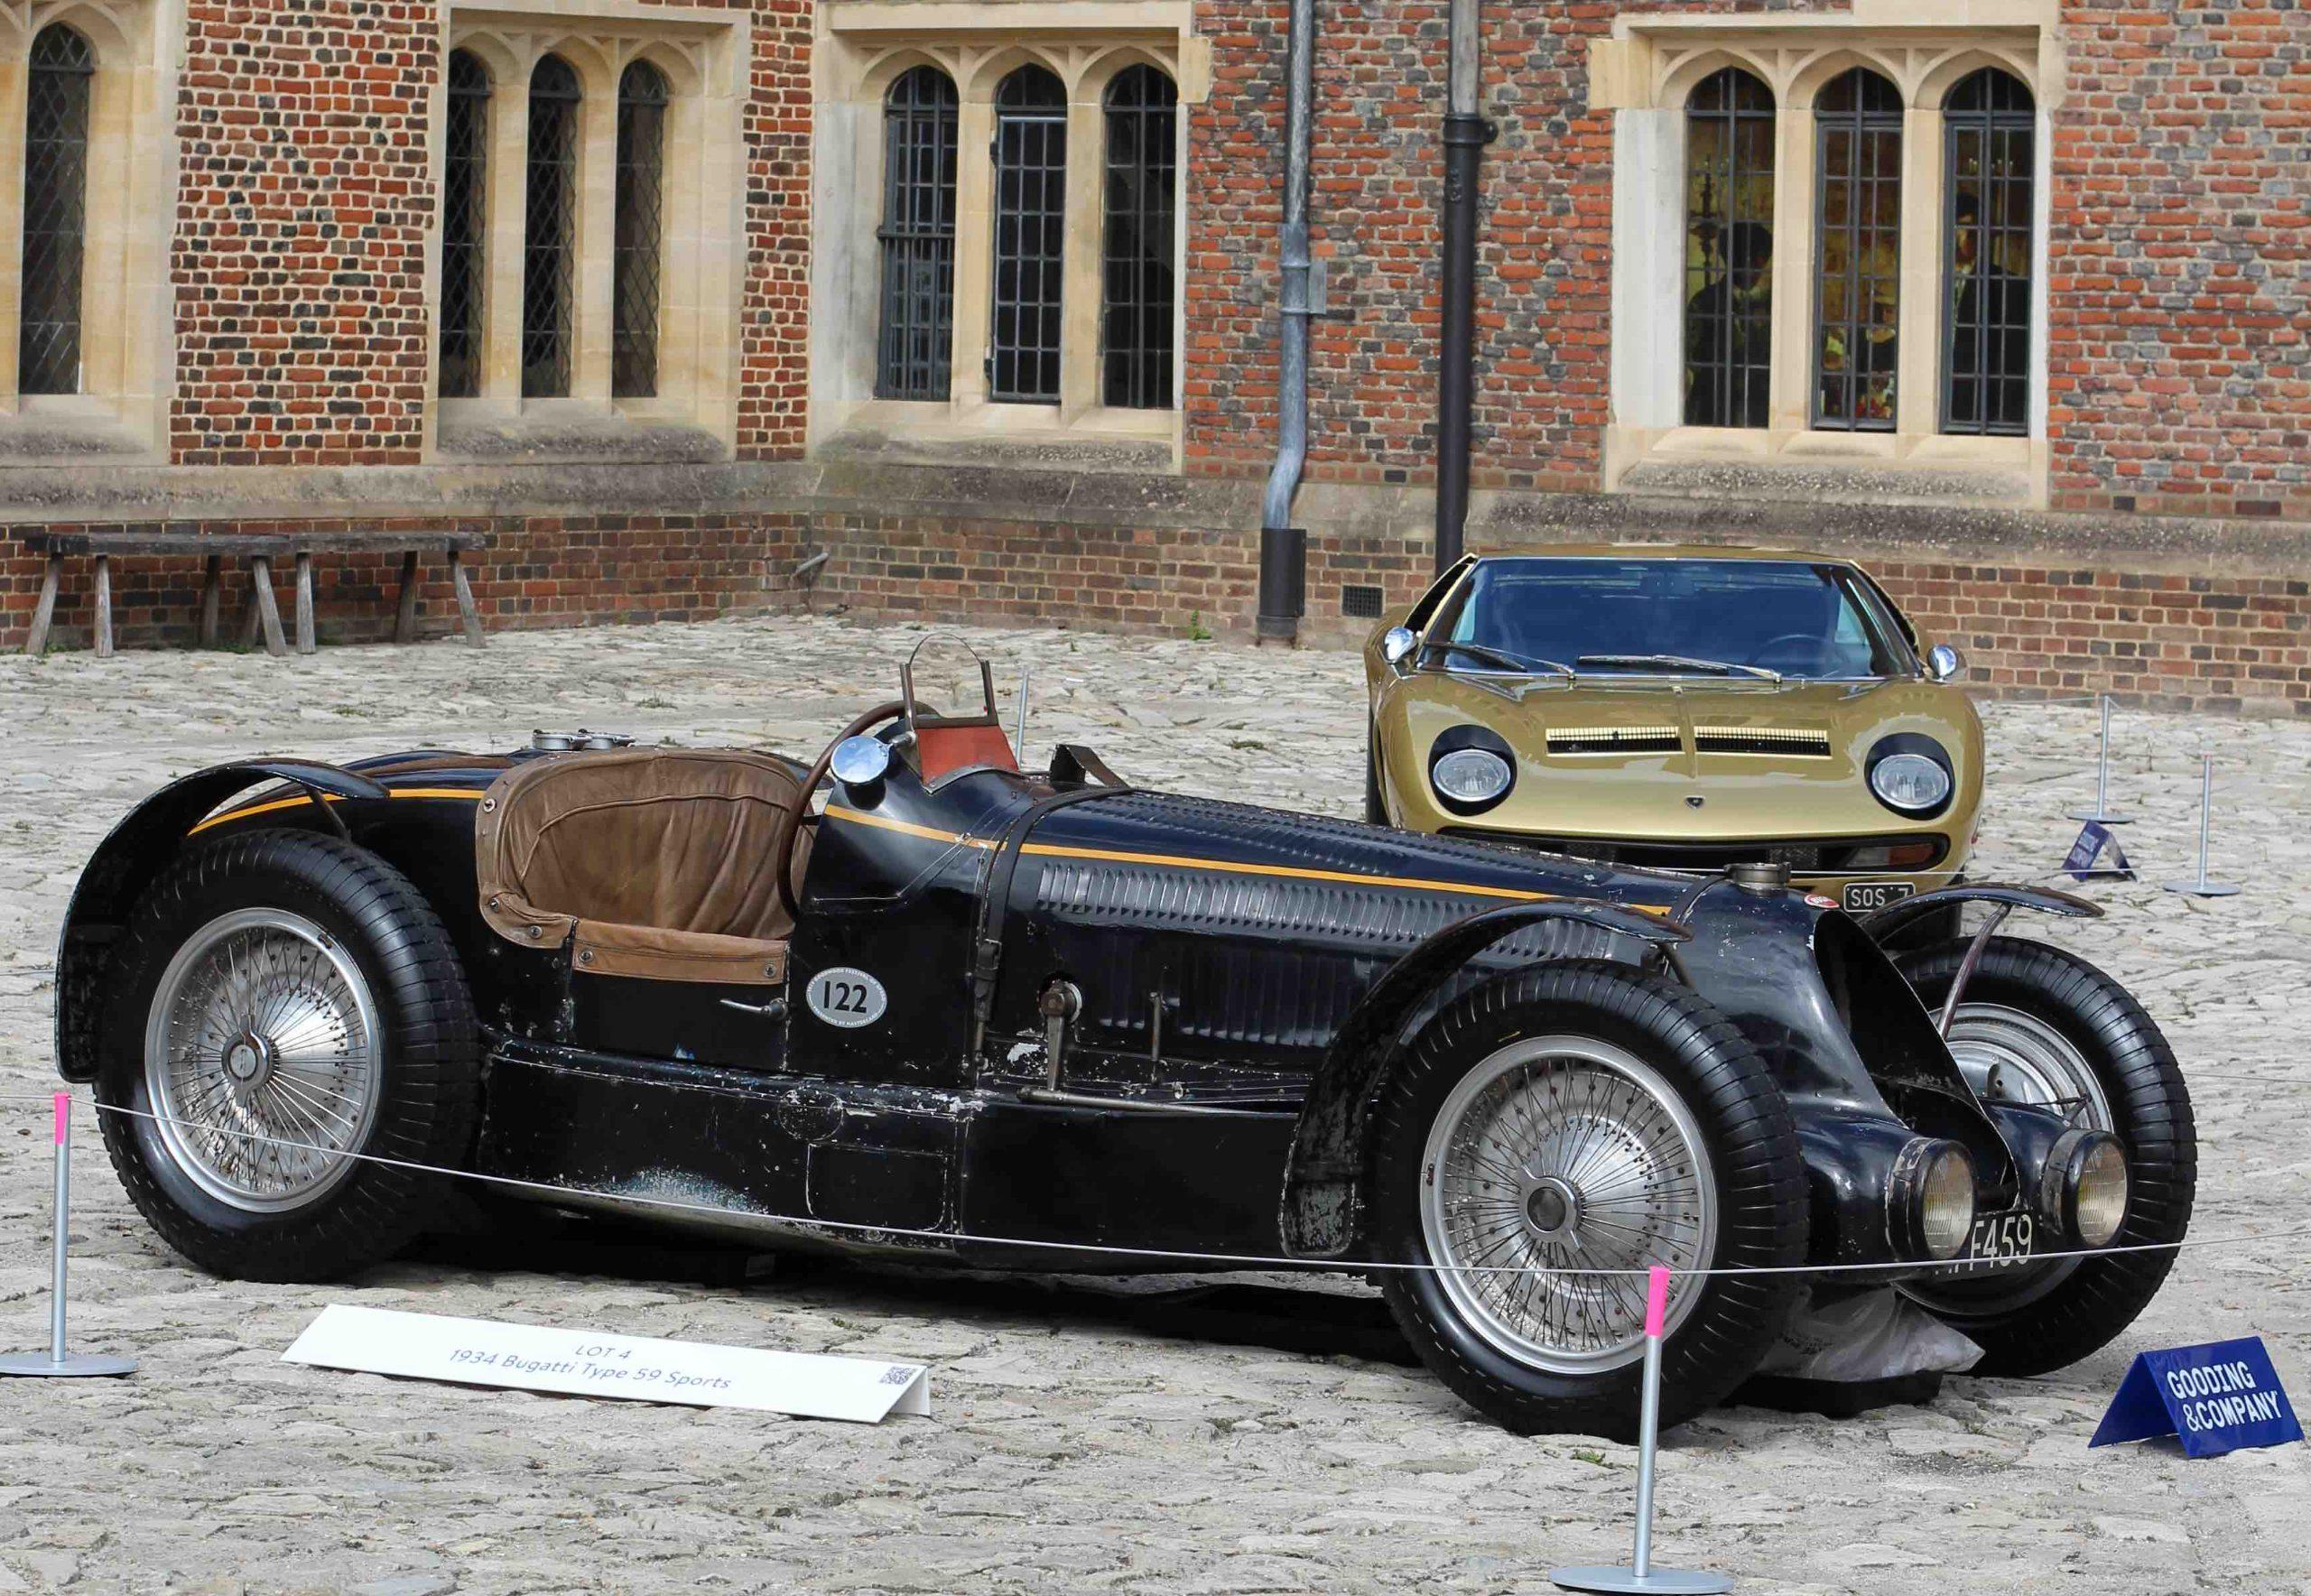 Gooding's Passion of a Lifetime auction dazzles at Hampton Court